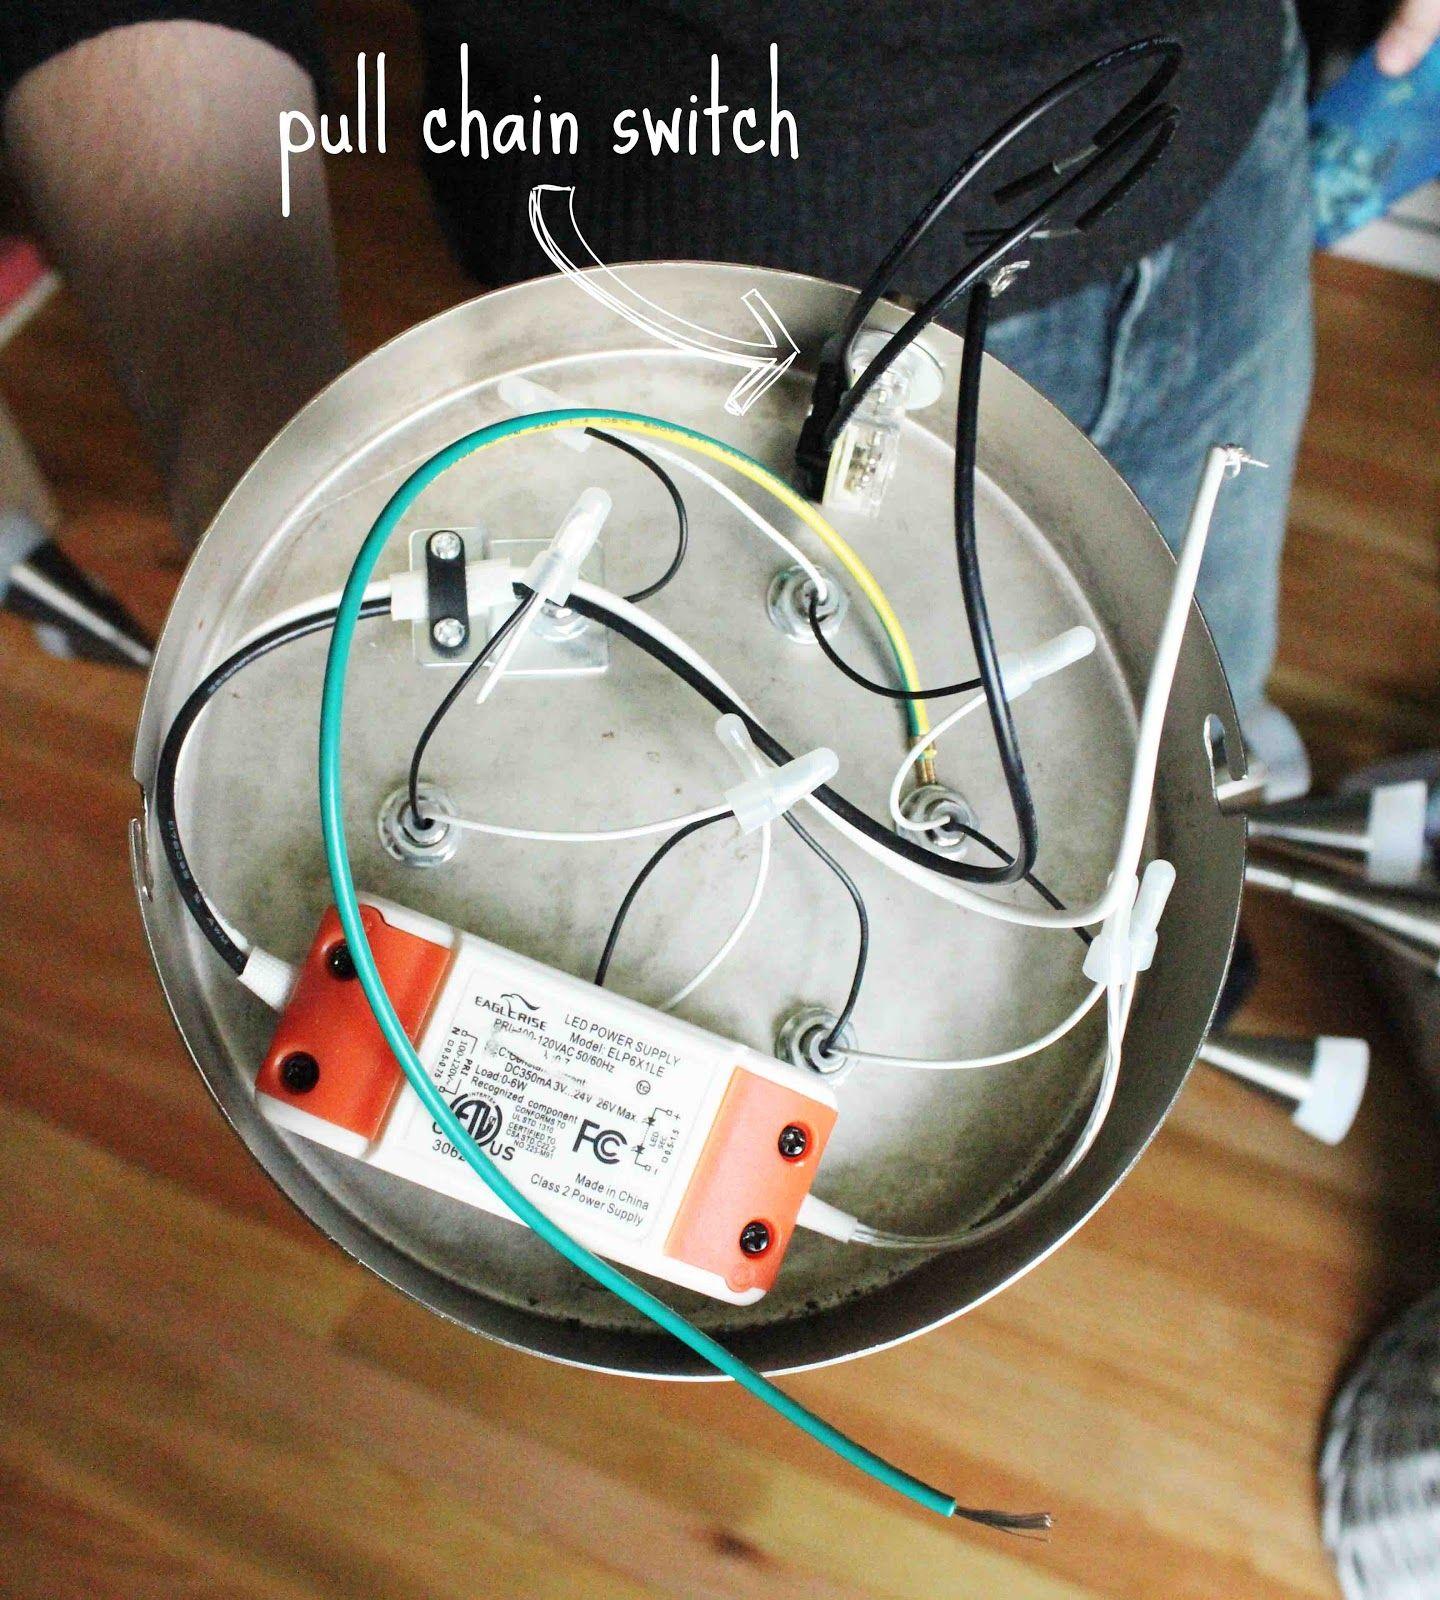 Convert Light Fixture To Pull Chain